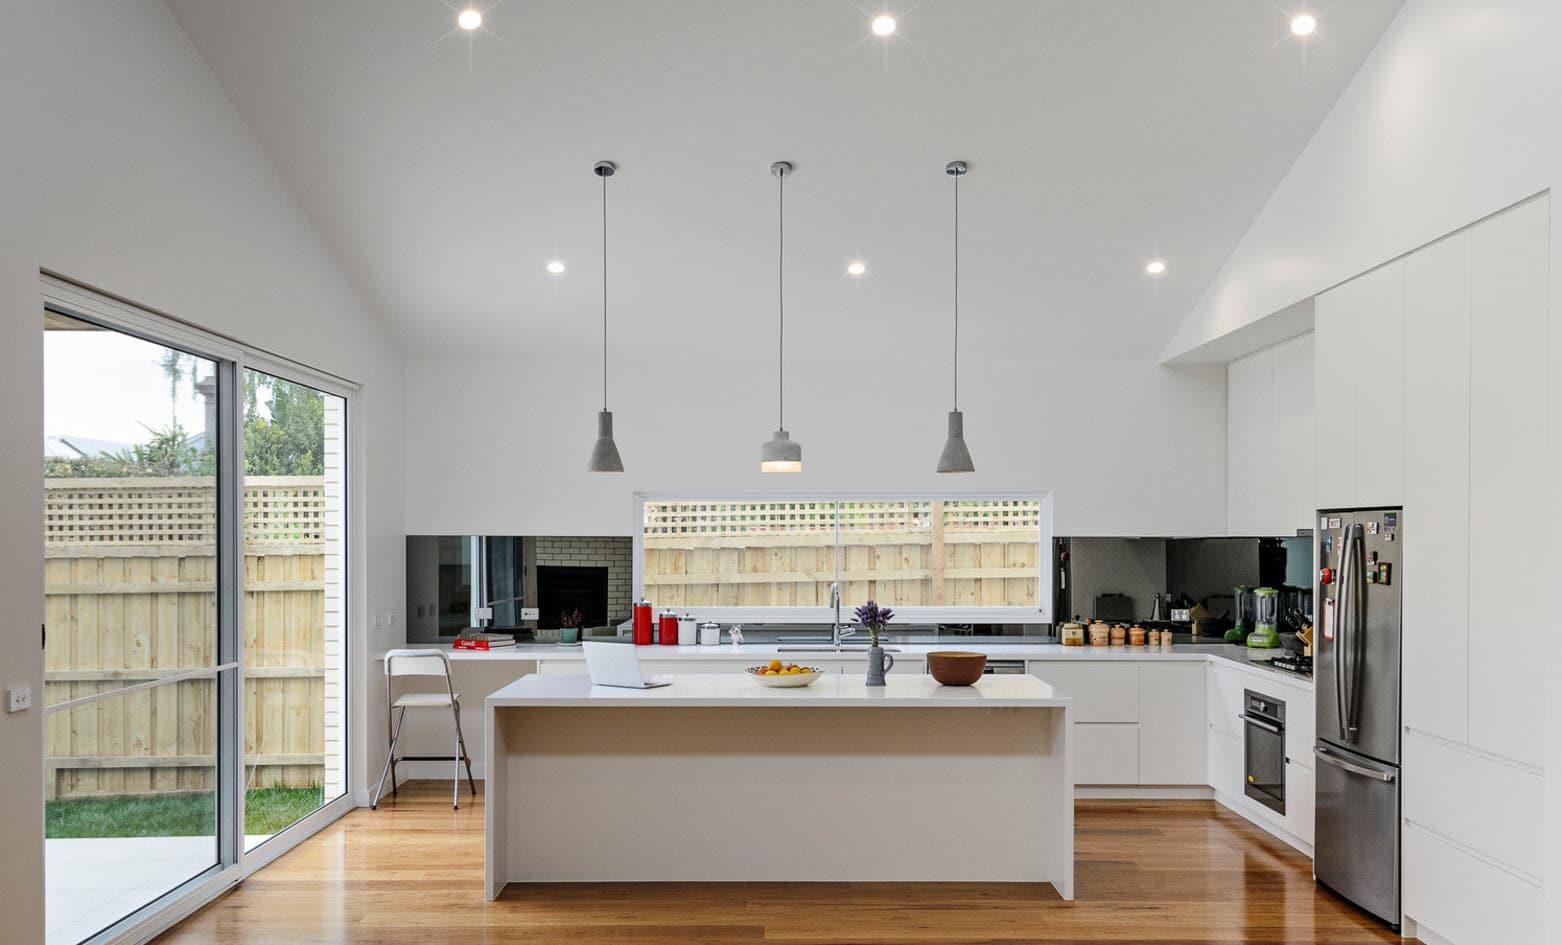 Planos de cocinas modernas awesome azulejos cocinas for Planos de cocinas modernas